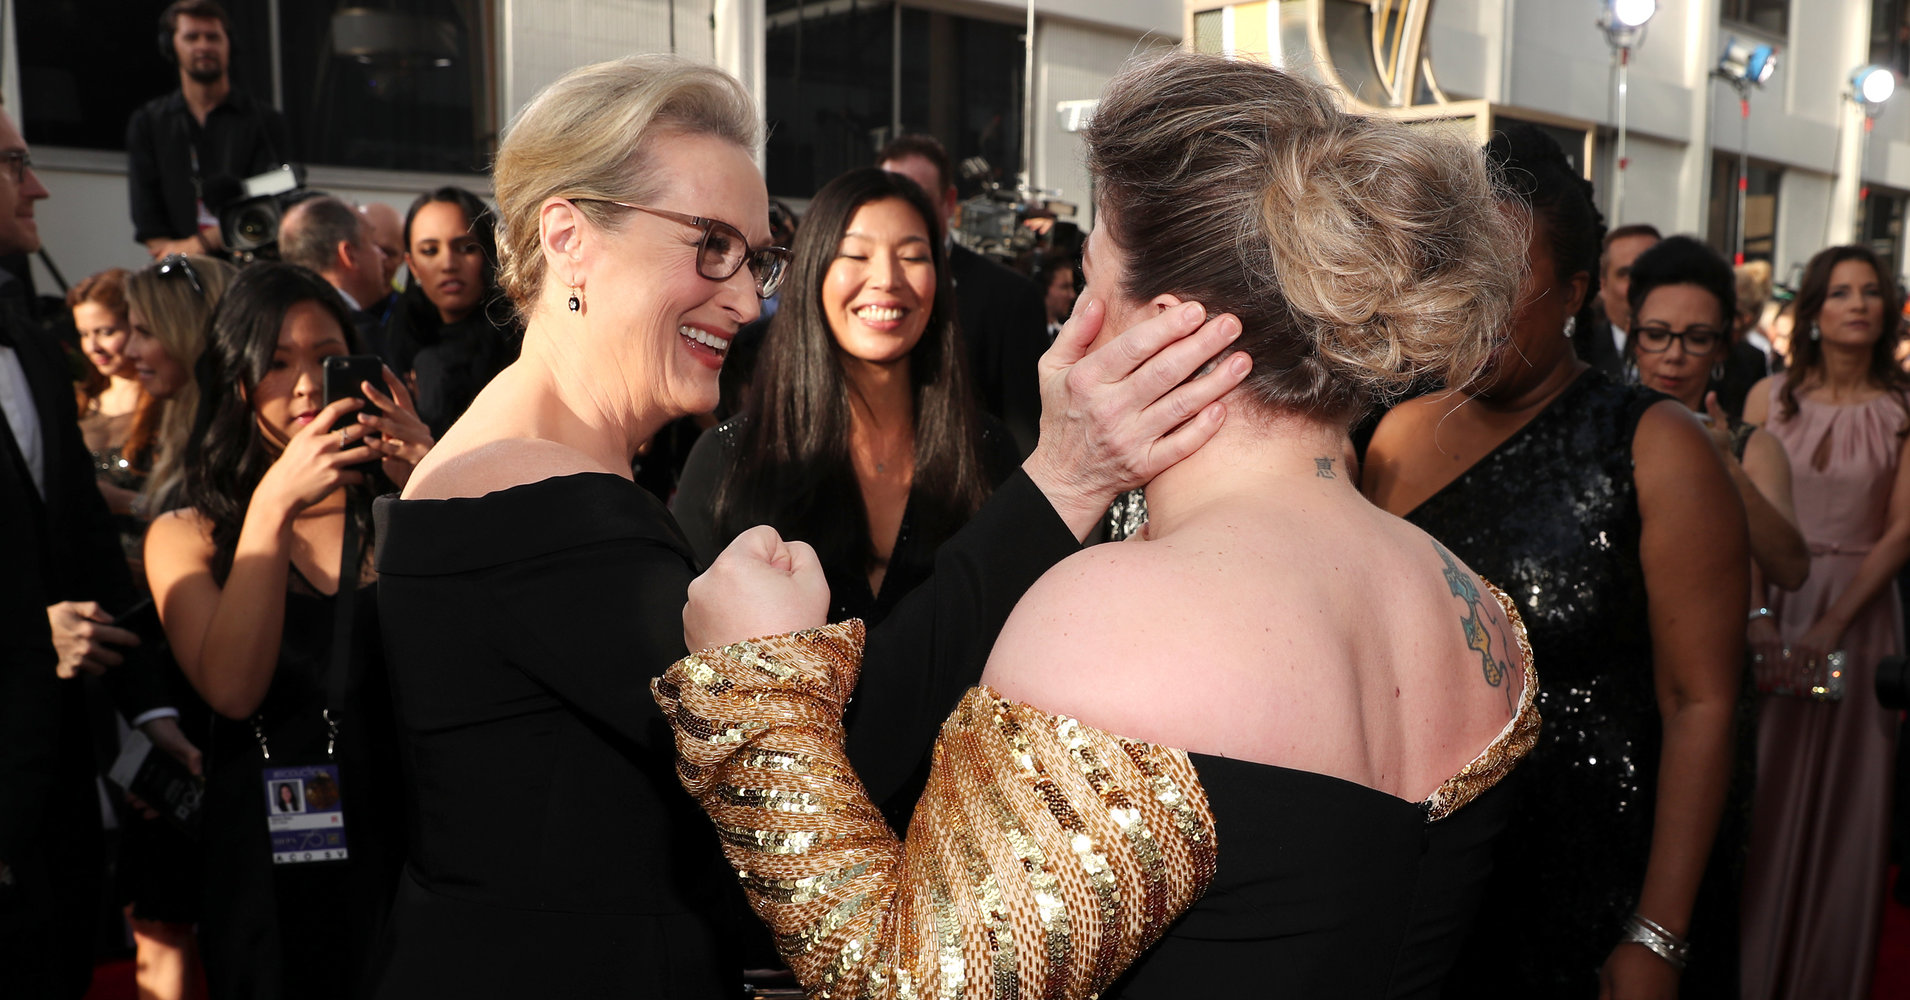 A Stunning Look At 4 Decades Worth Of Meryl Streep's Oscars Style